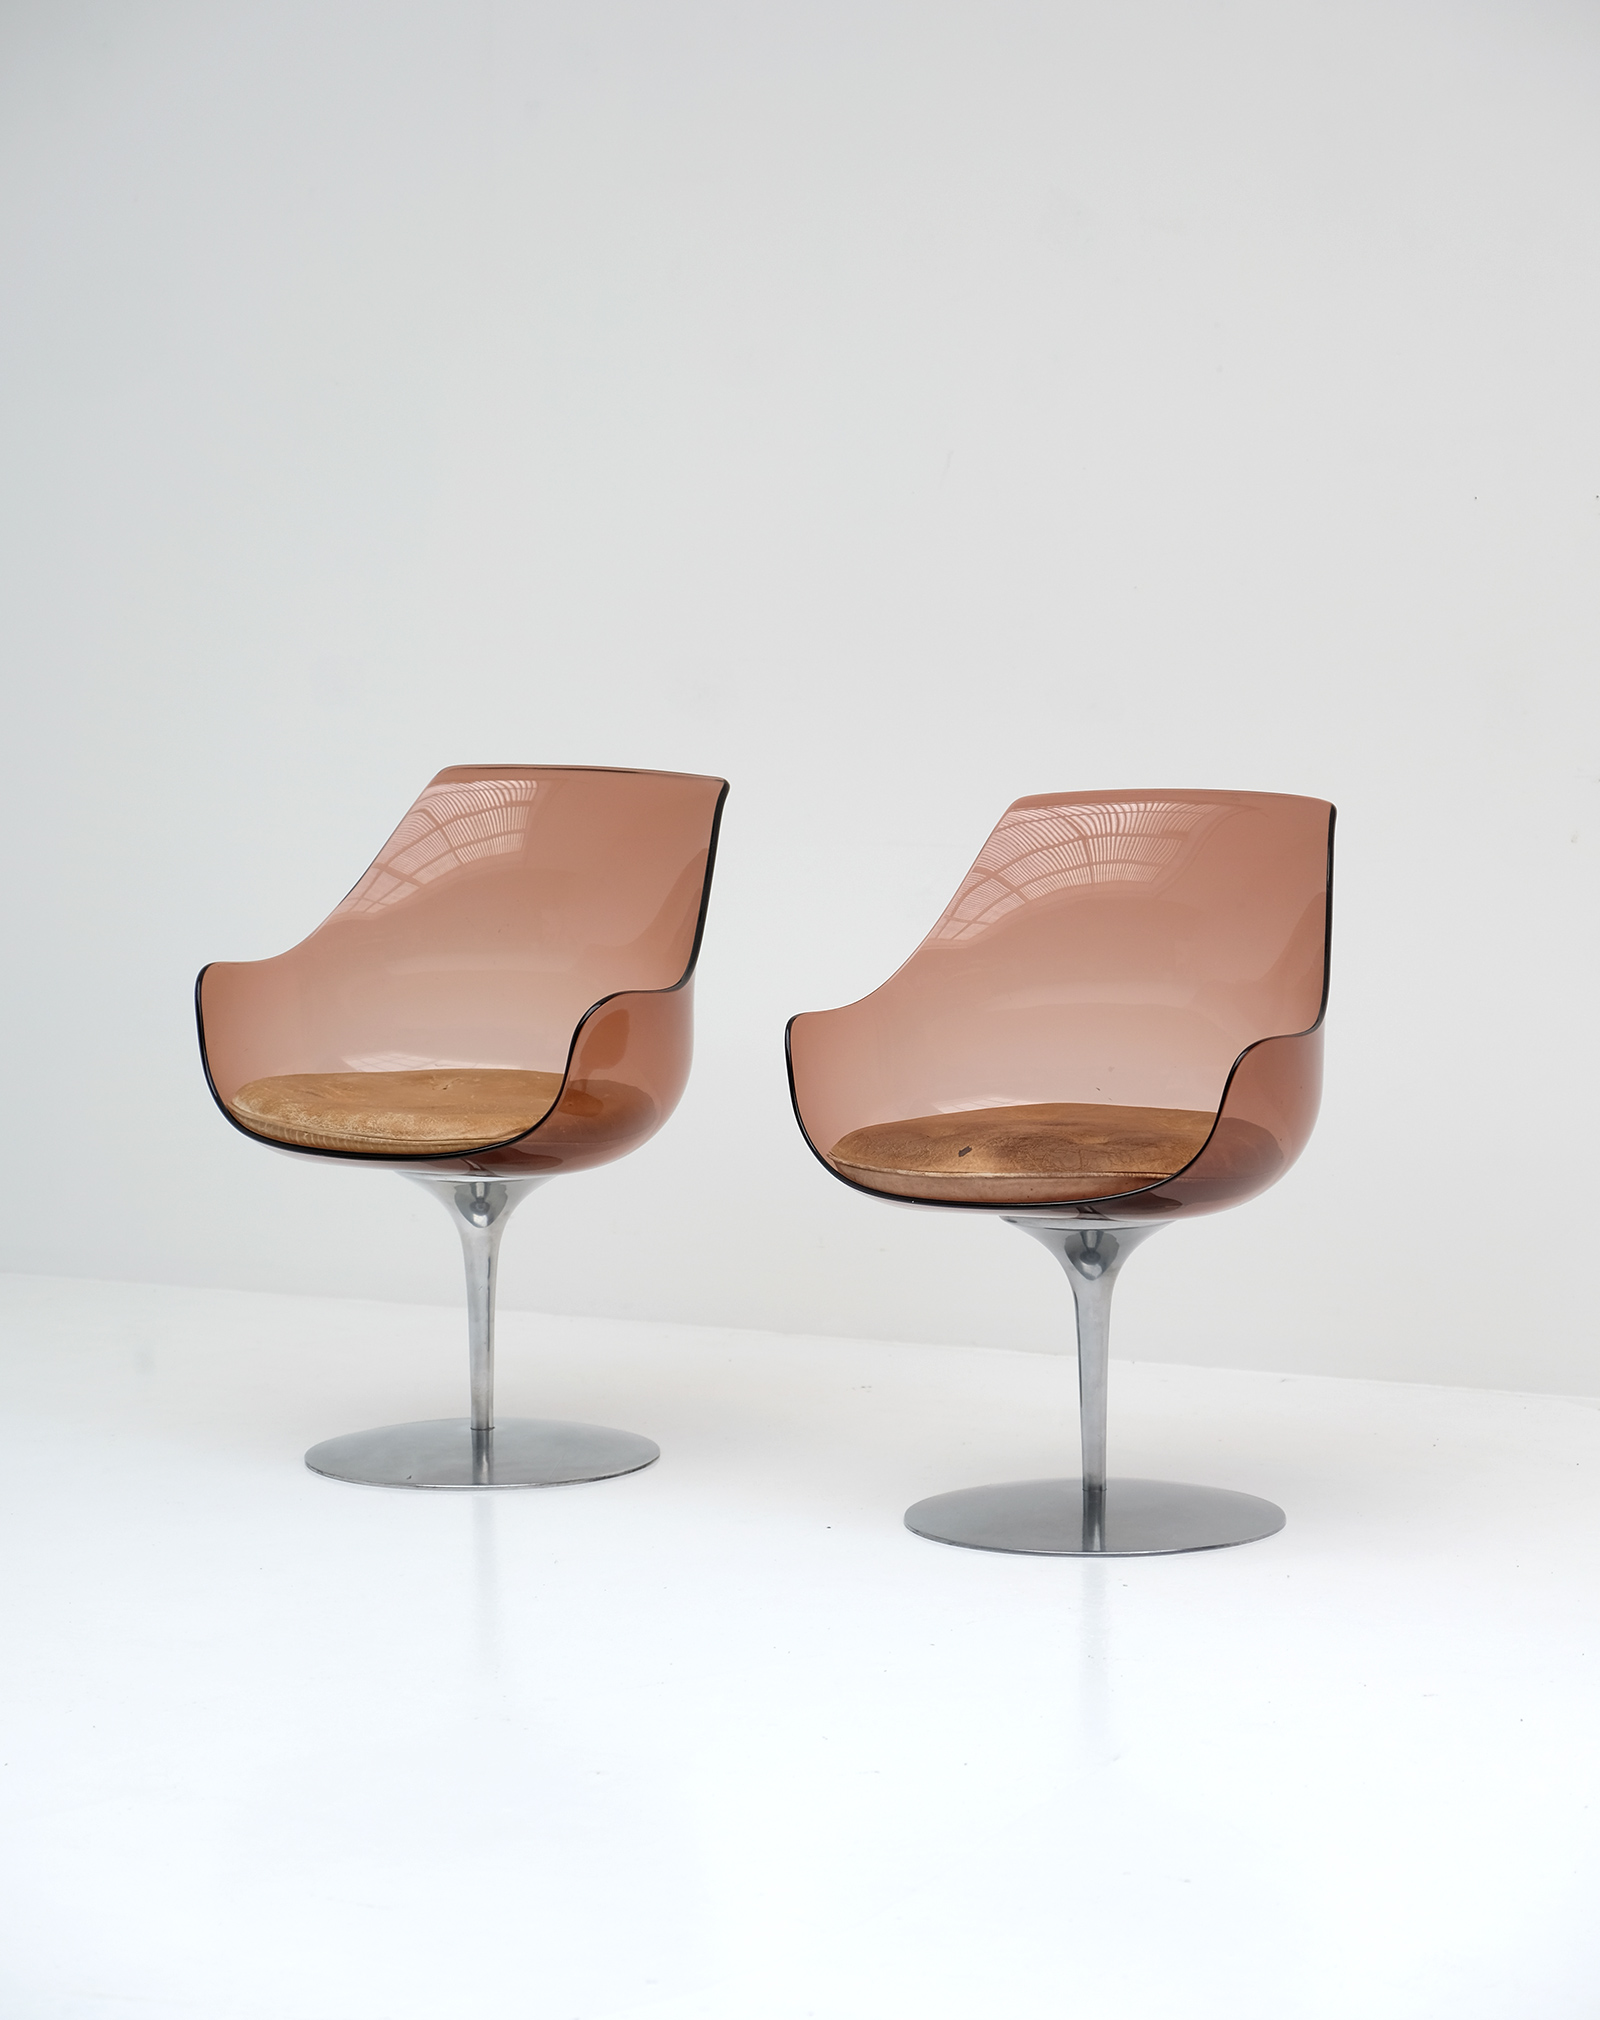 Laverne Champagne Chairs Formes Nouvellesimage 2